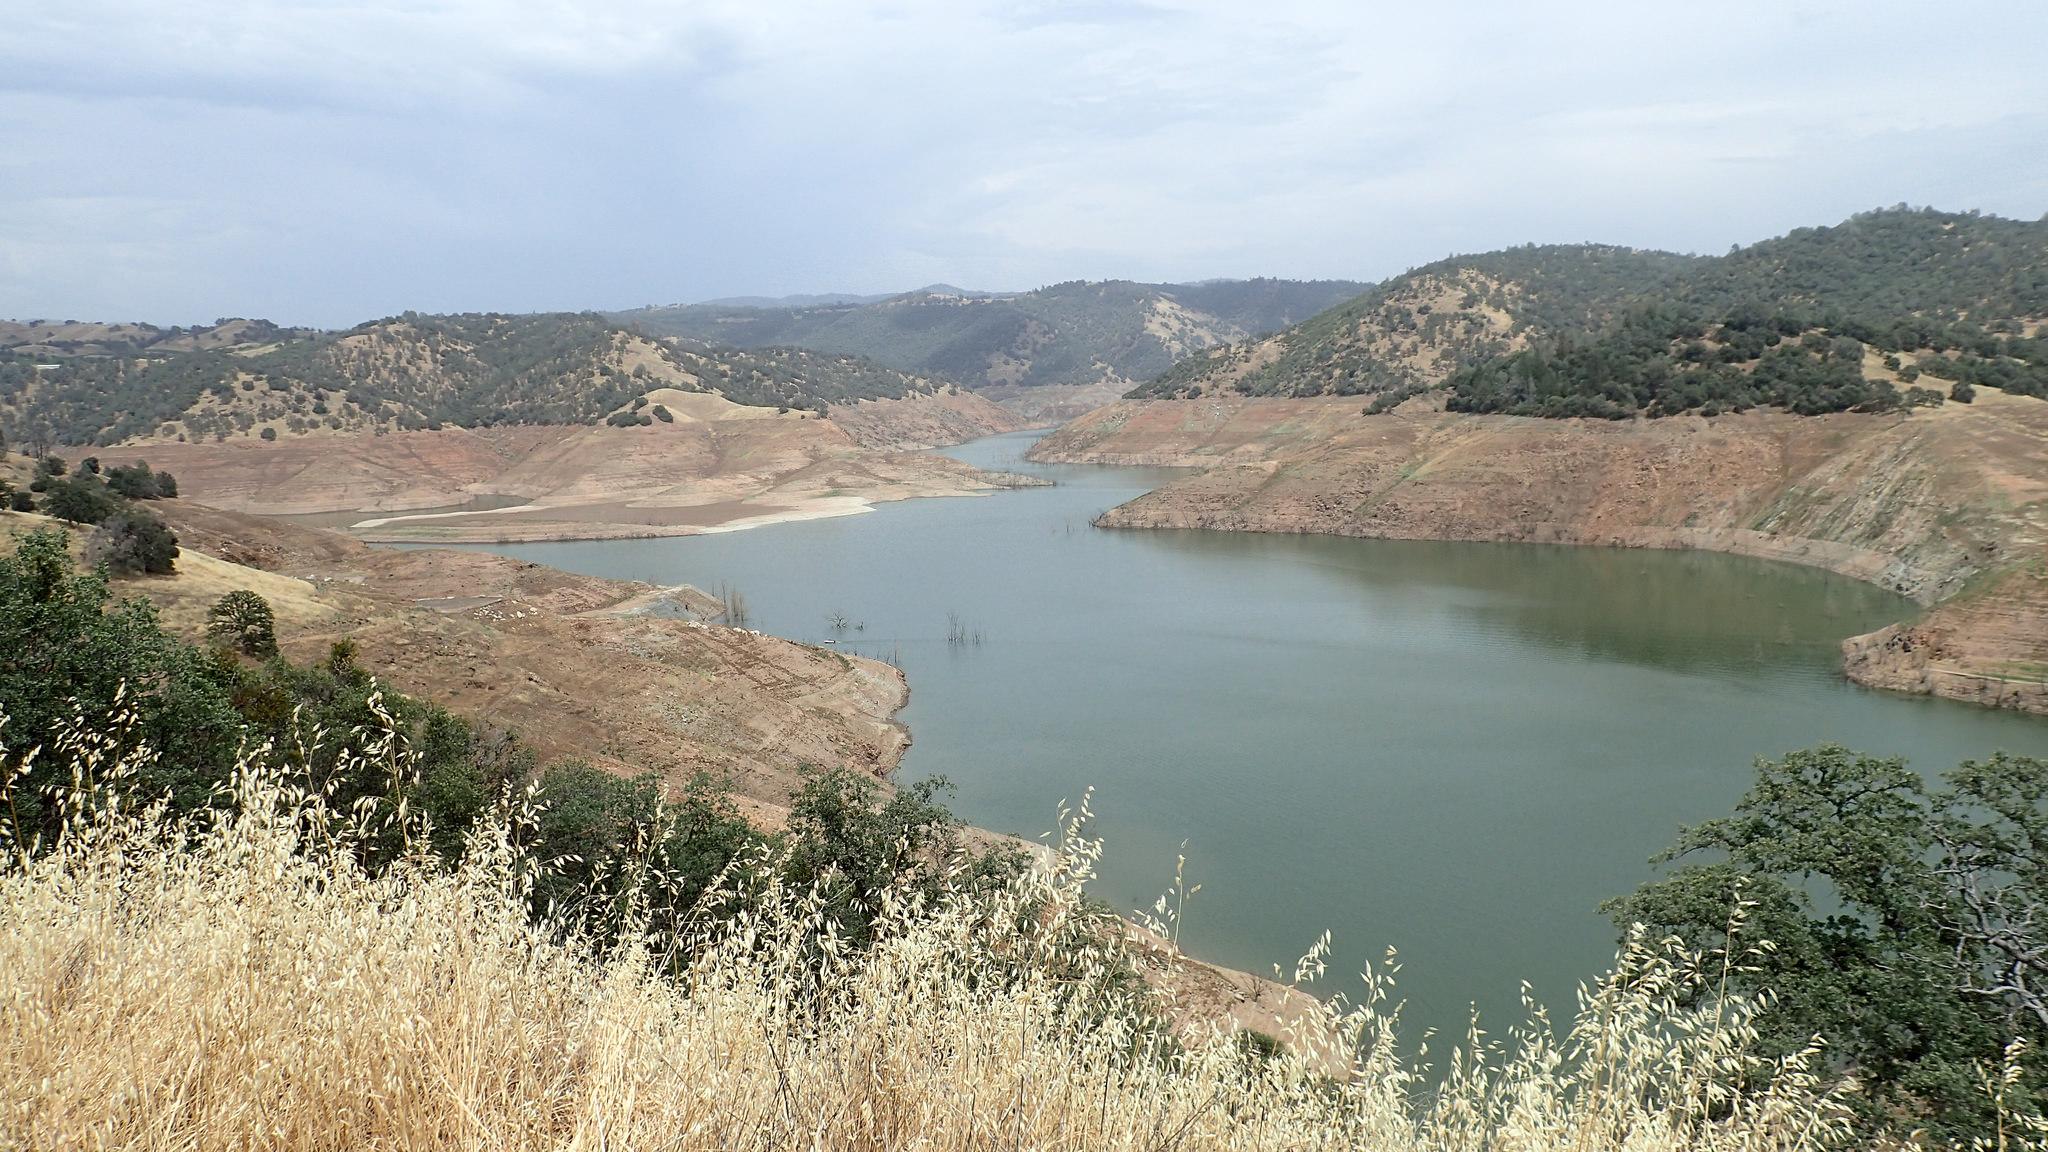 New Melones Reservoir June 2015